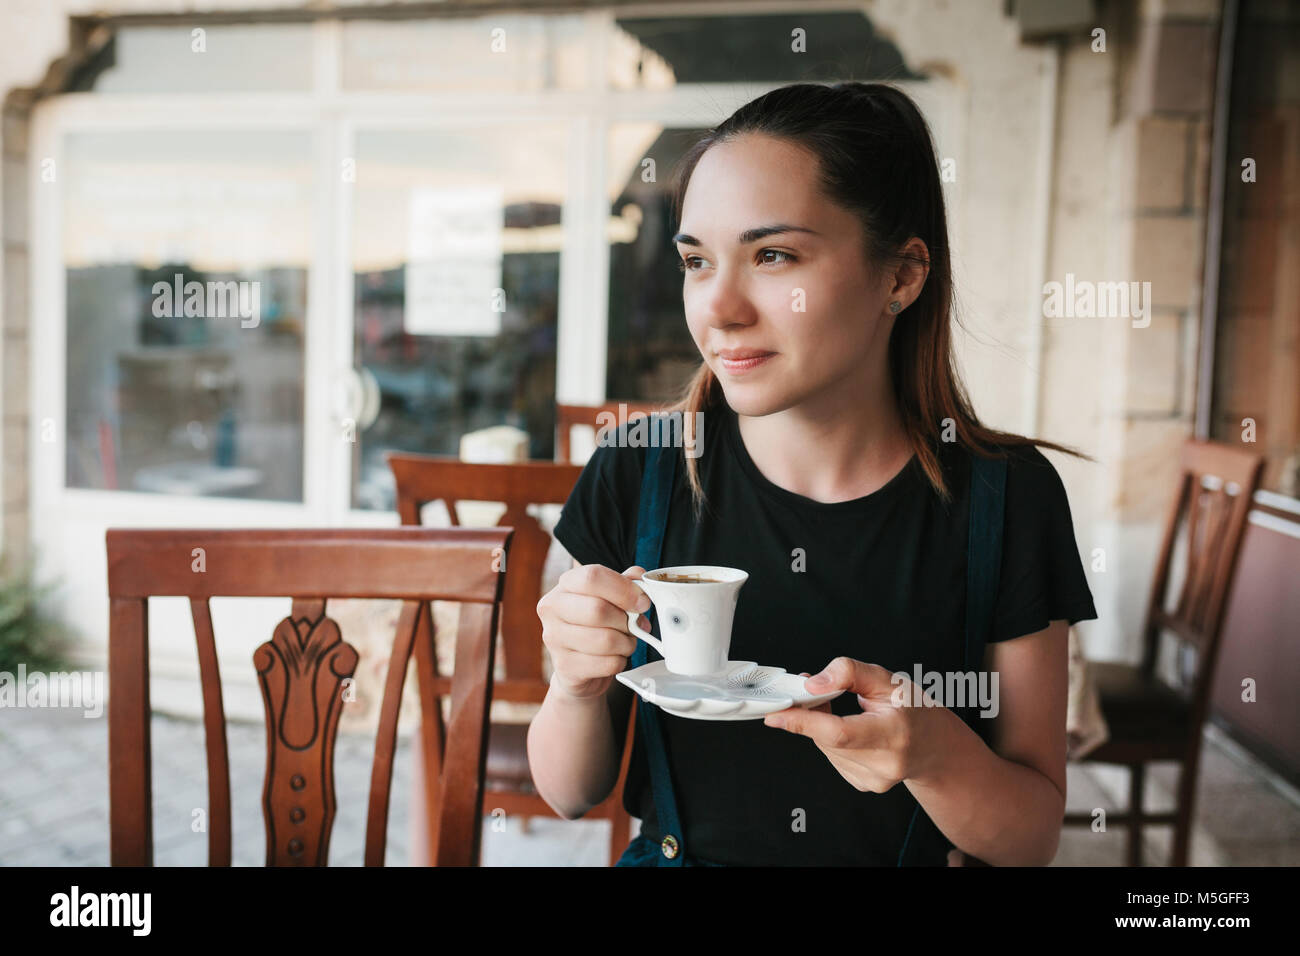 Schöne Frau trinkt Kaffee in dem Cafe Stockbild